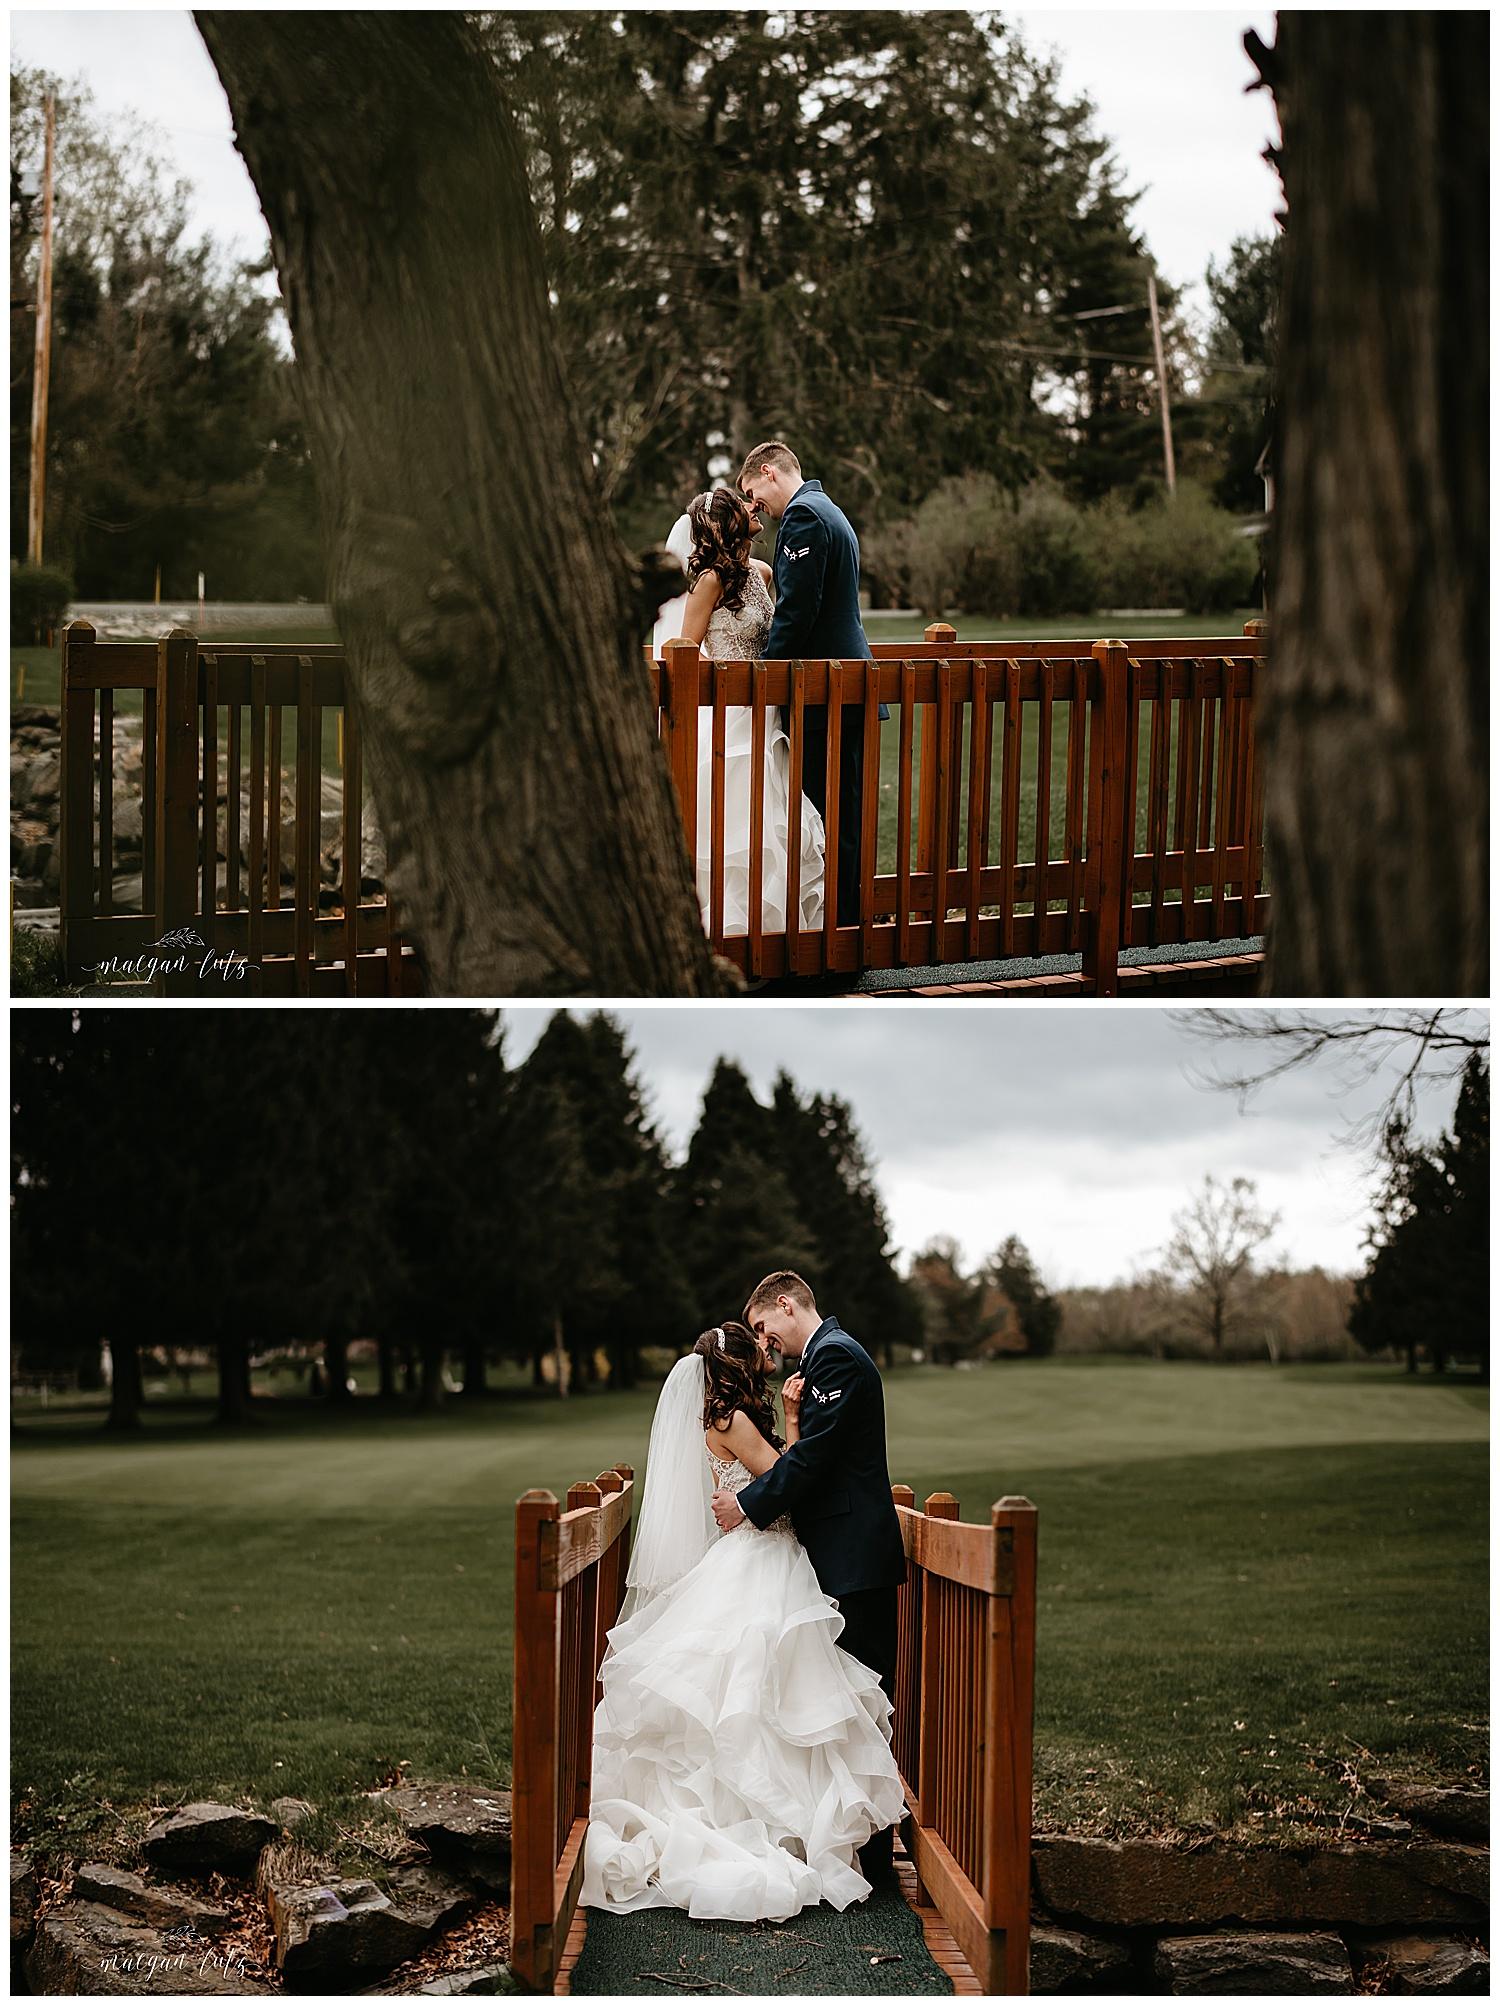 NEPA-Lehigh-Valley-Wedding-Photographer-at-Glen-Oak-Country-Club-Clarks-Summit-PA_0032.jpg